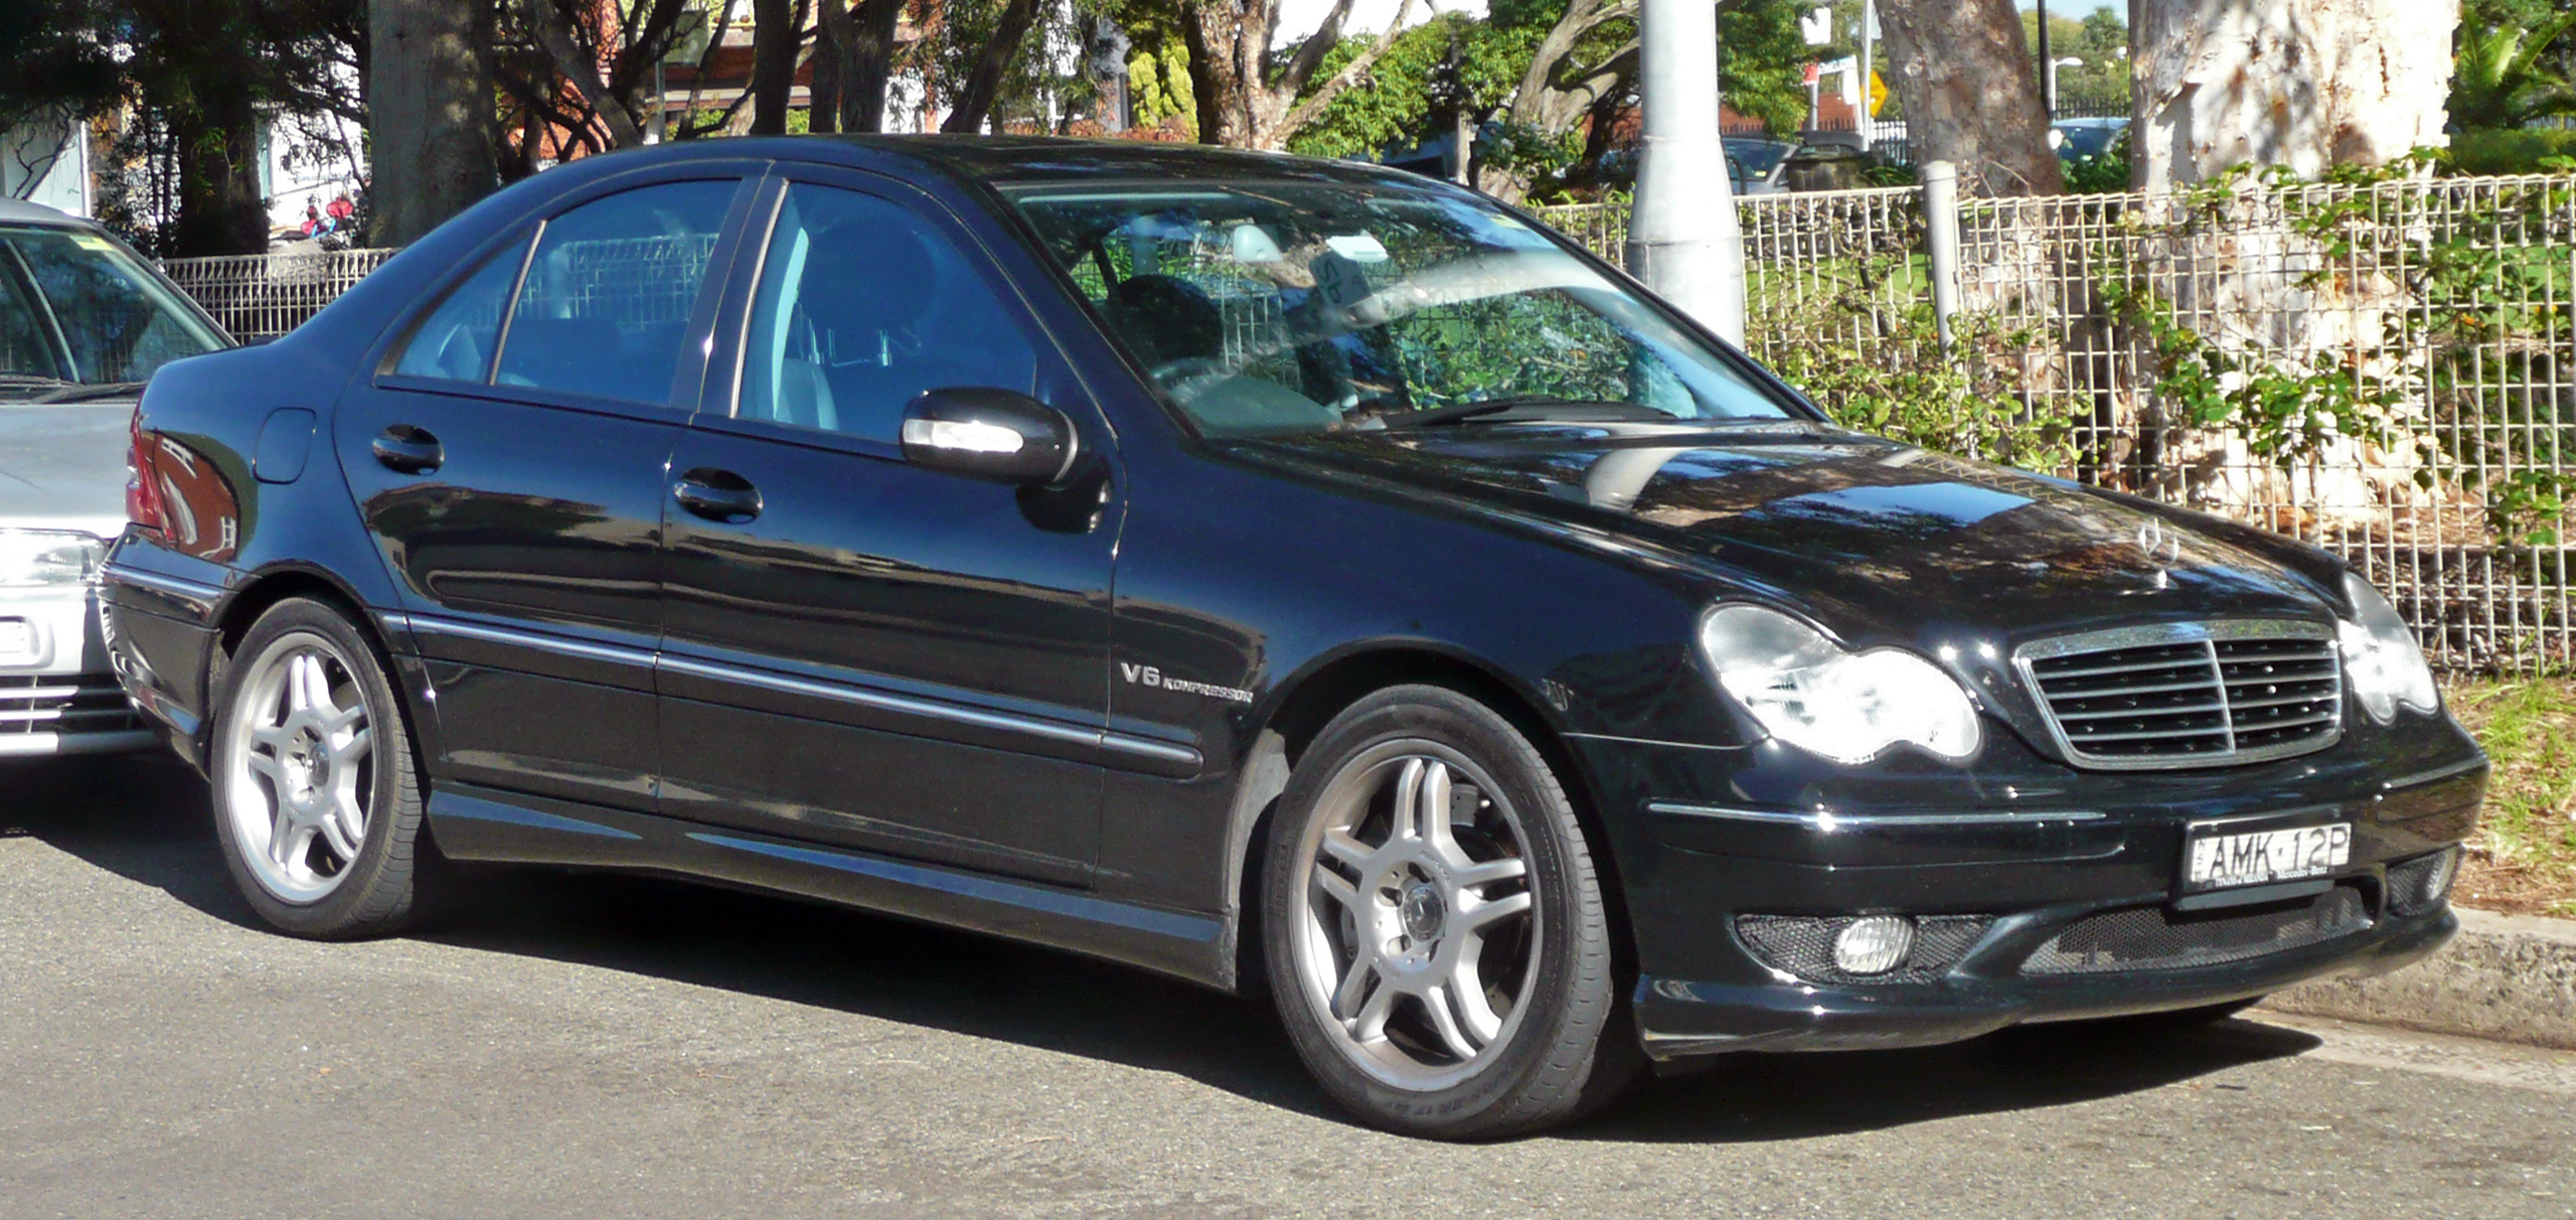 Mercedes benz c 32 amg photos 13 on better parts ltd for 2004 mercedes benz e320 parts